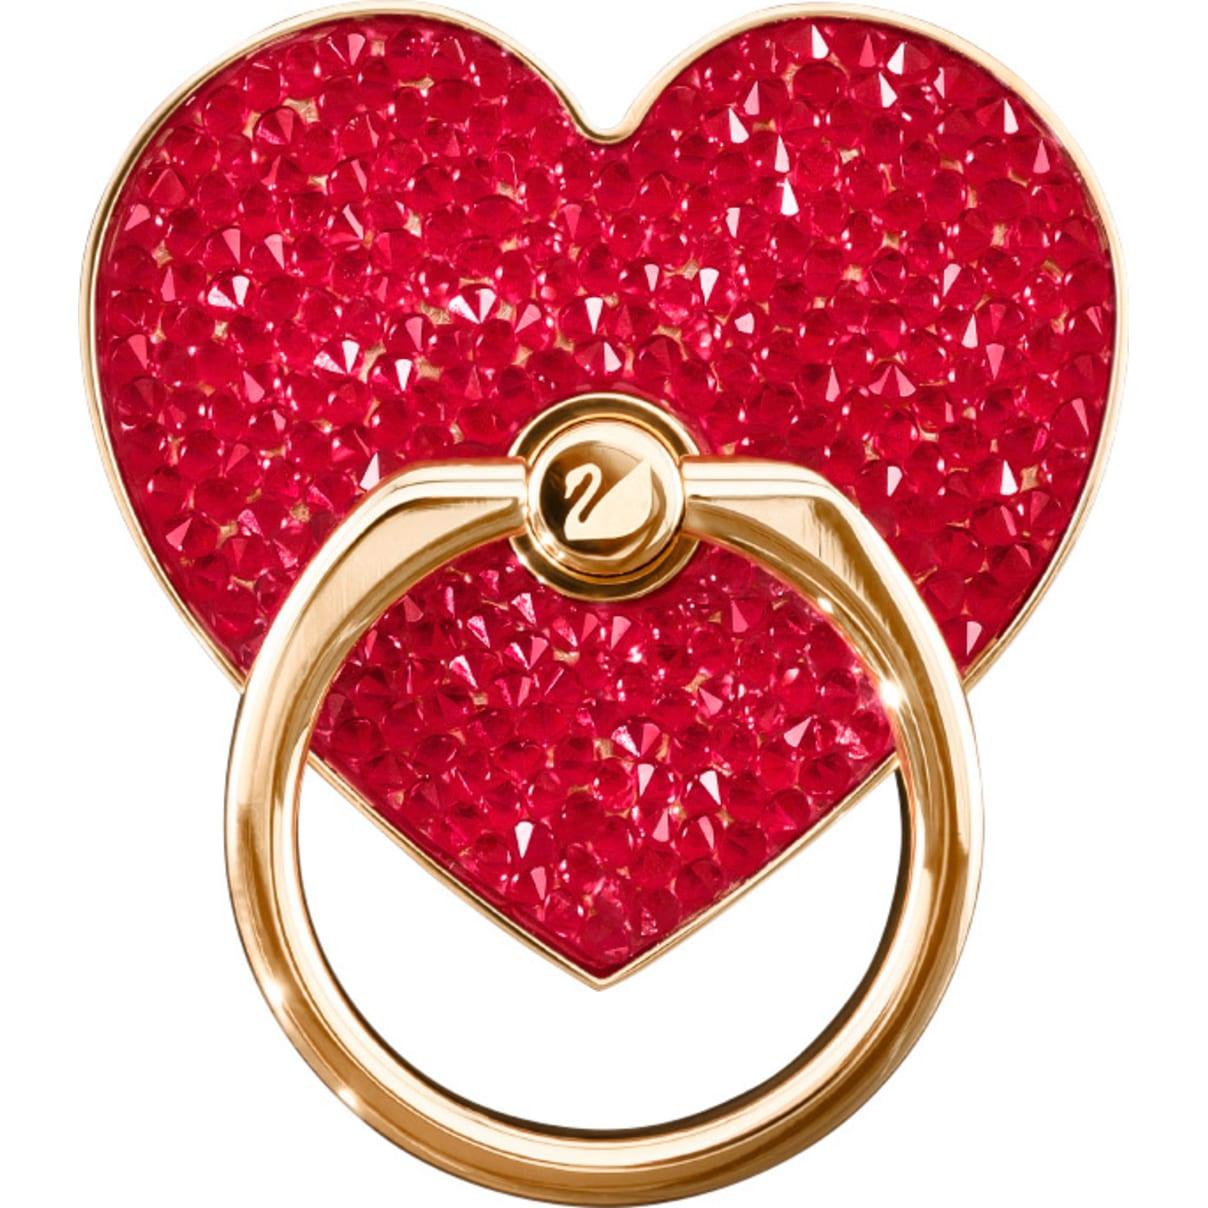 Swarovski Glam Rock Ring Sticker, Red, Mixed plating